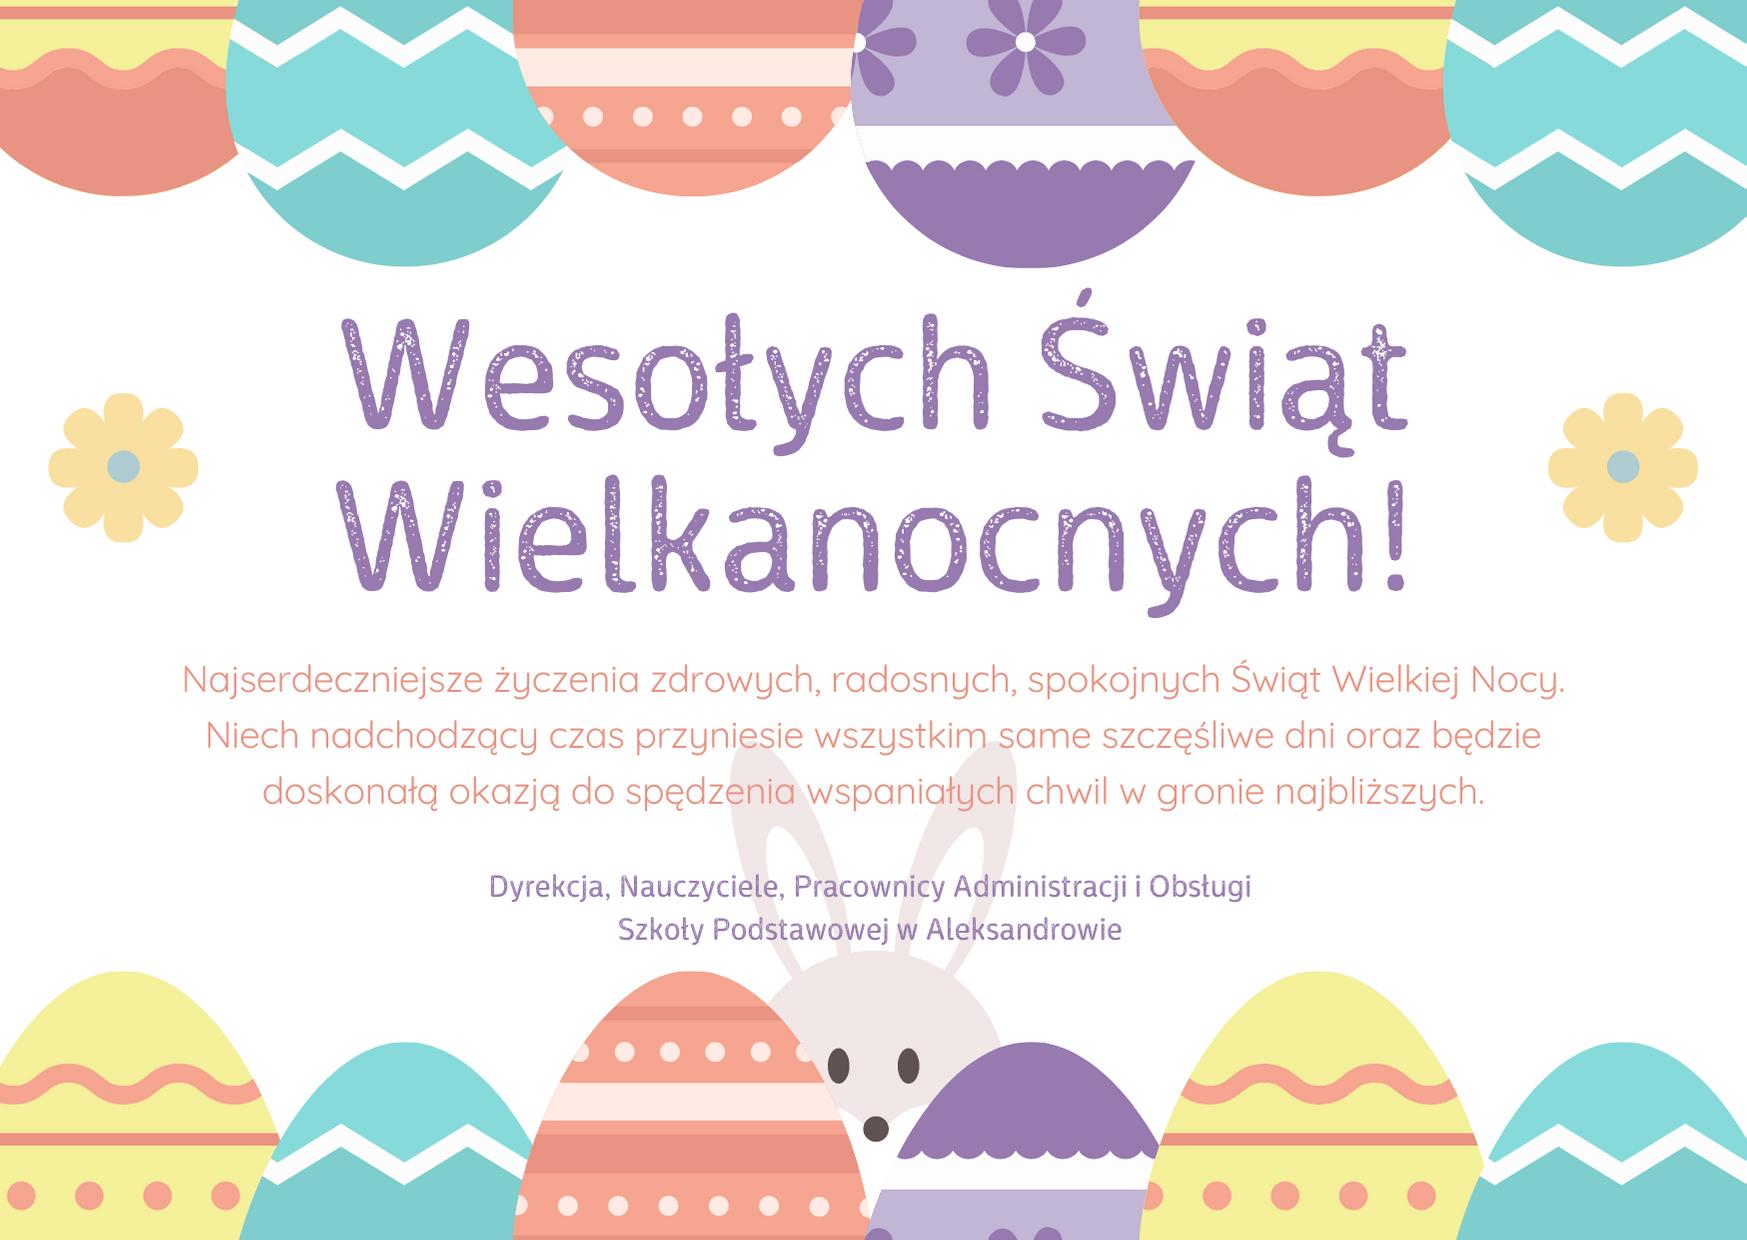 http://szkola.ealeksandrow.pl/download/Pastelowa%20Pisanki%20Wielkanoc%20Kartka(1).png